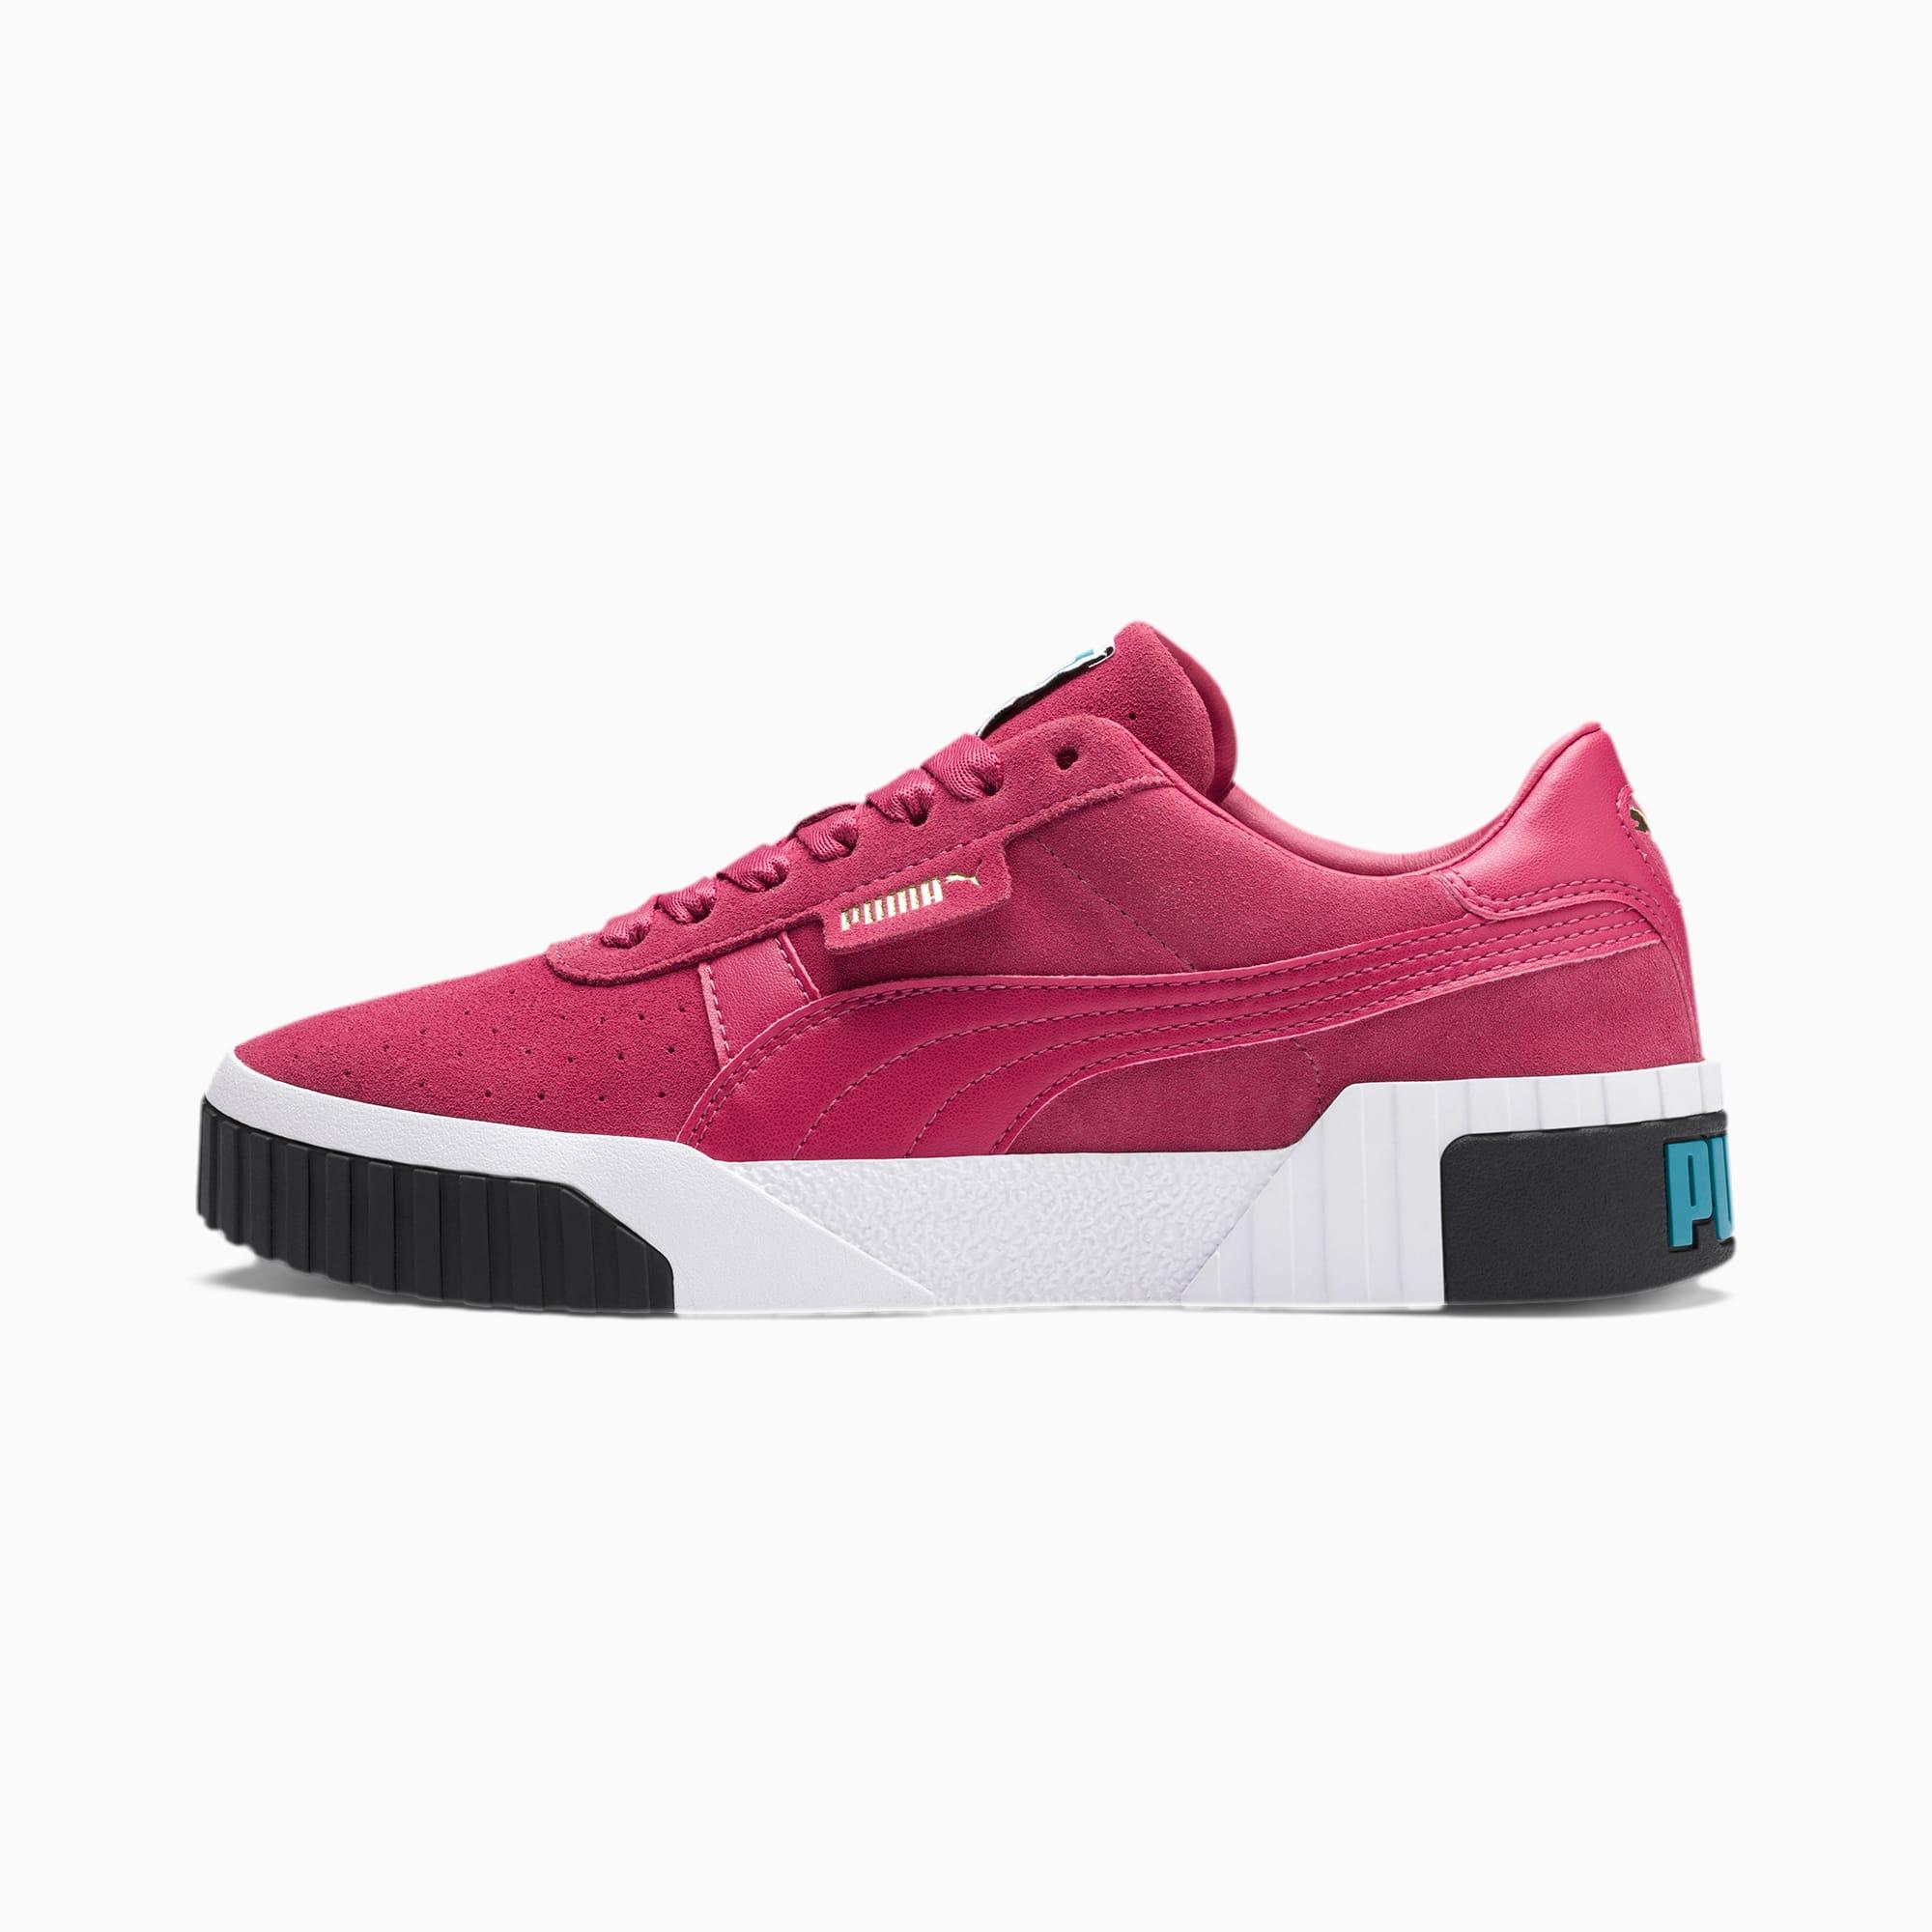 Cali Suede Women's Sneakers